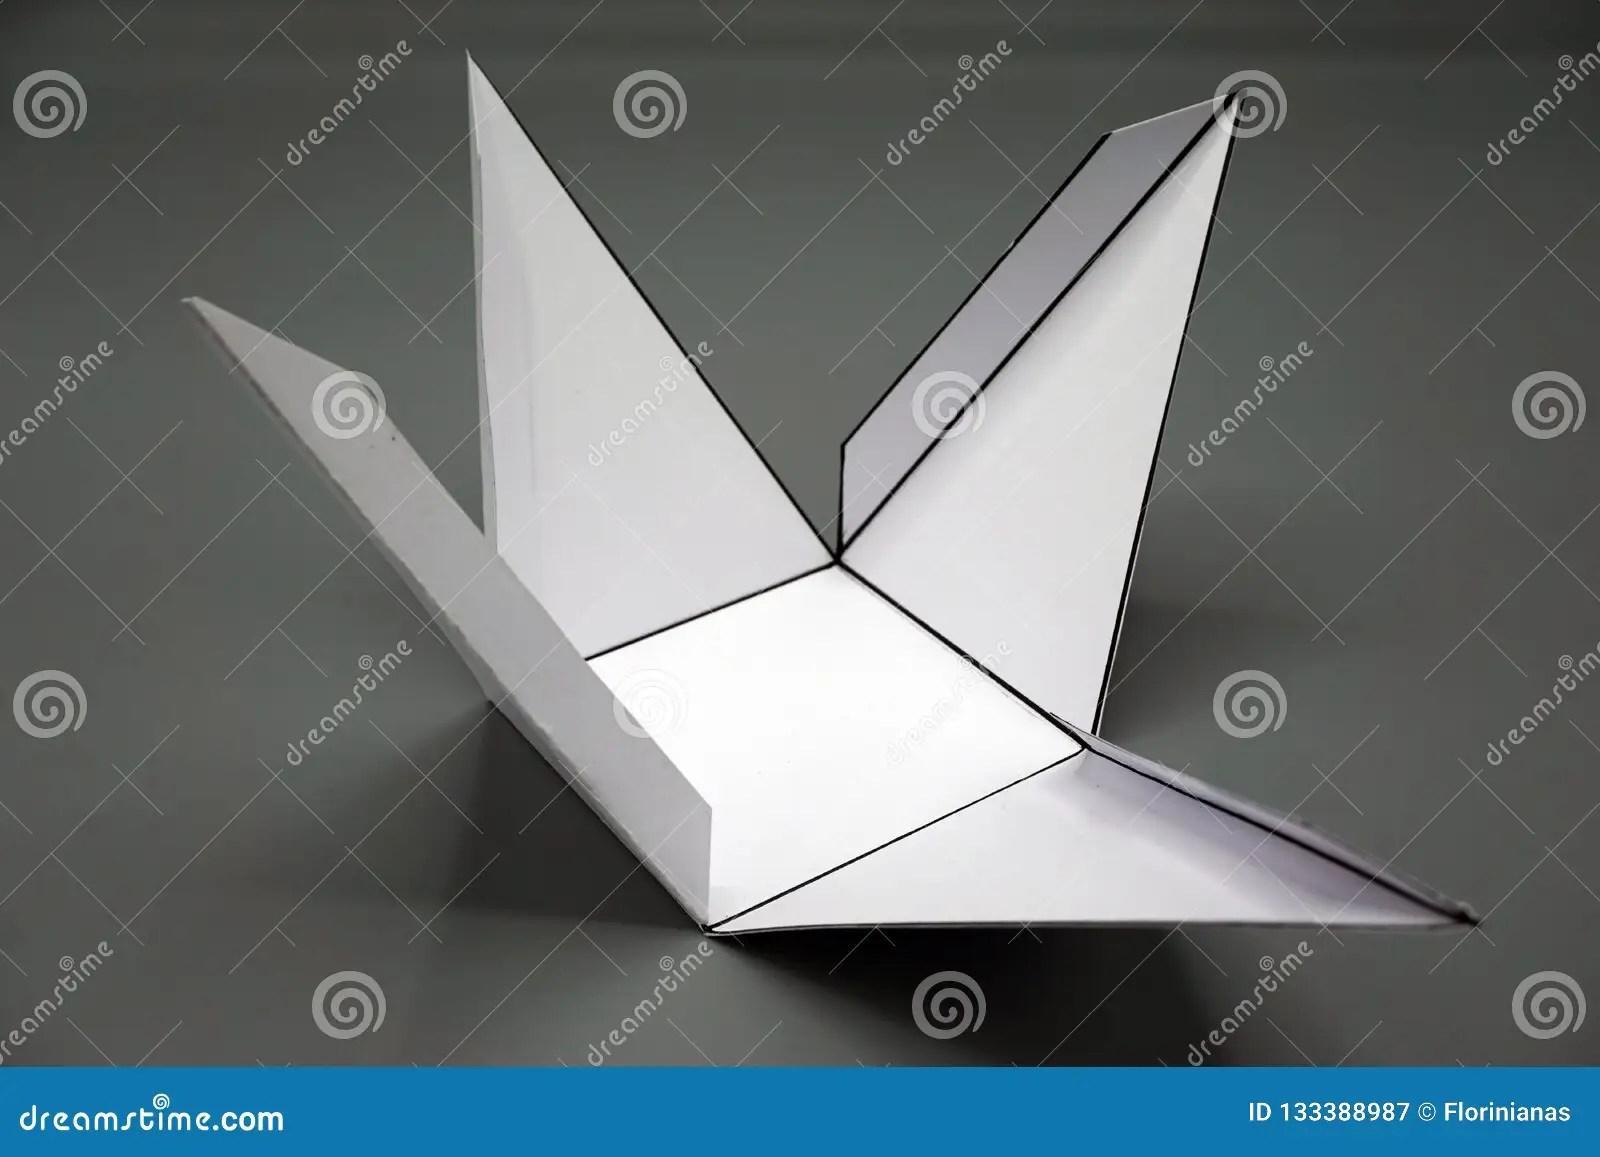 Geometry Net Of Rectangular Pyramid Stock Image